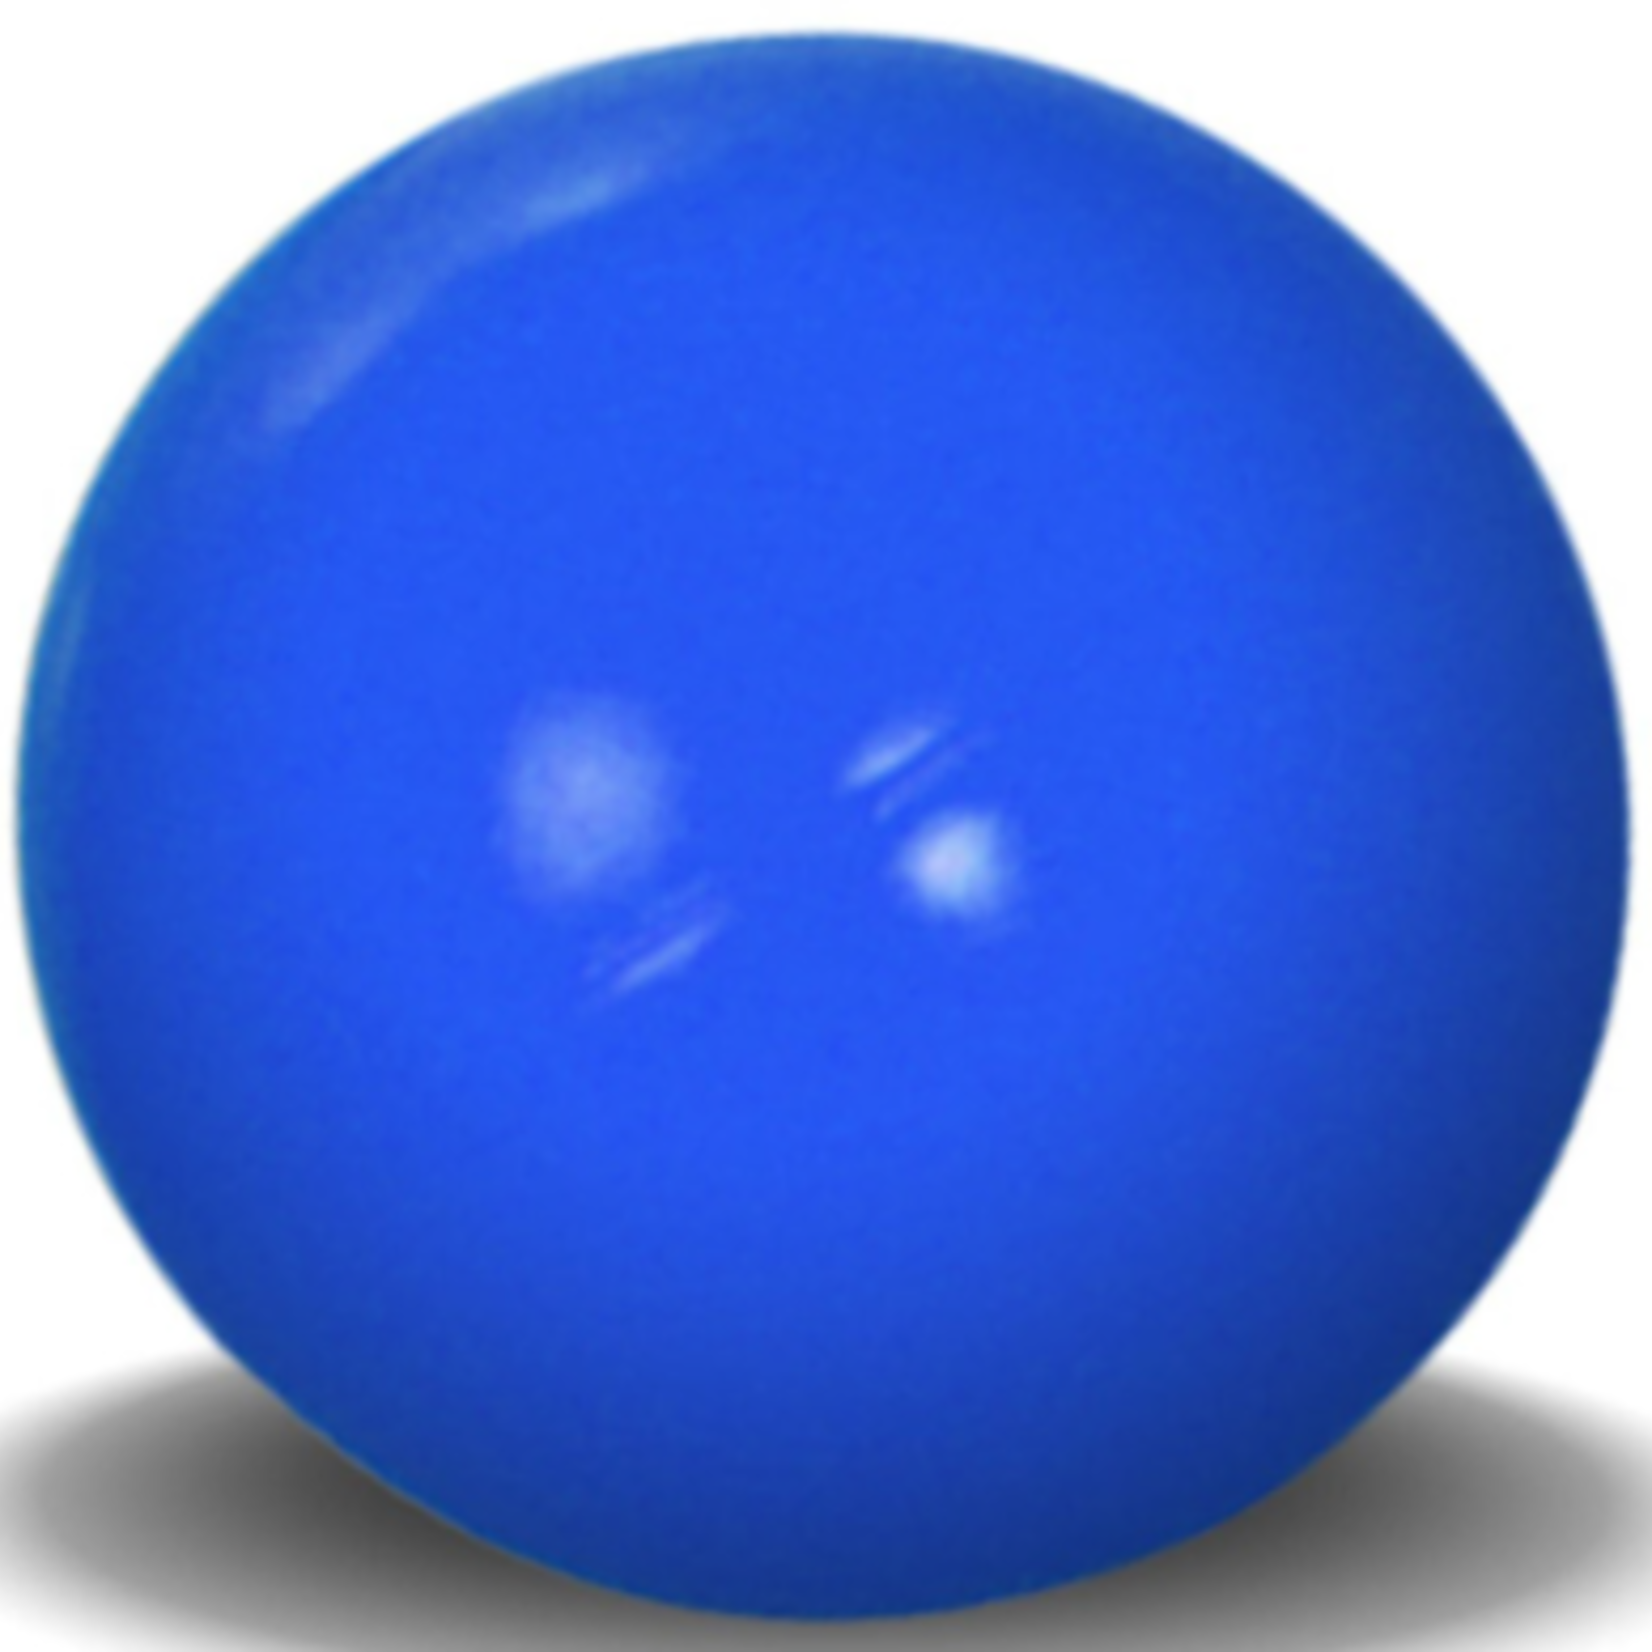 Hunter Brand Virtually Indestructible Best Ball-4.5 in-Orange